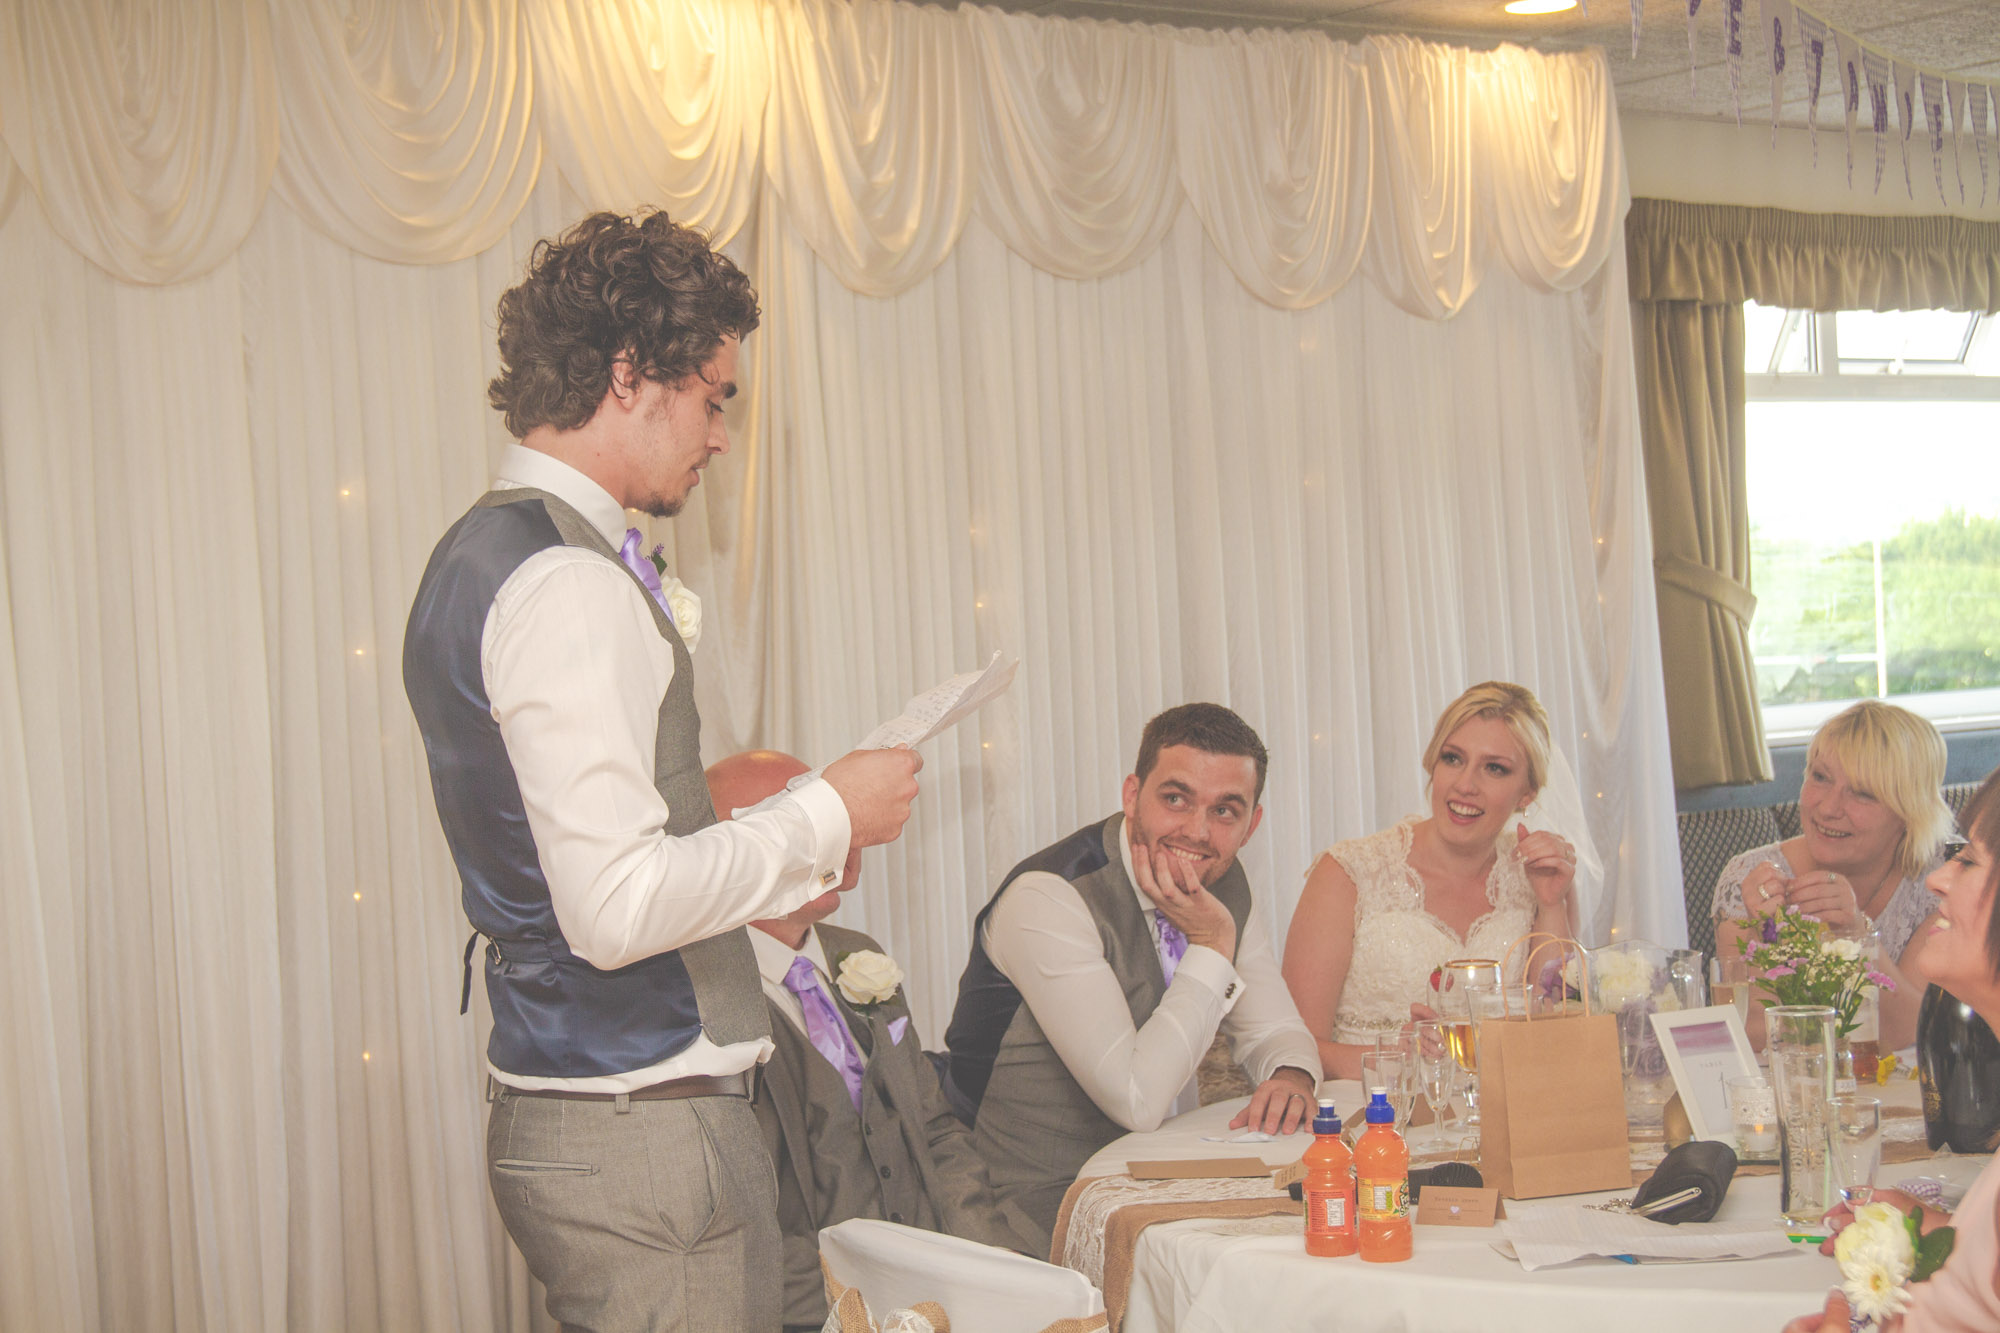 skipton-registry-office-wedding-photography-48.jpg